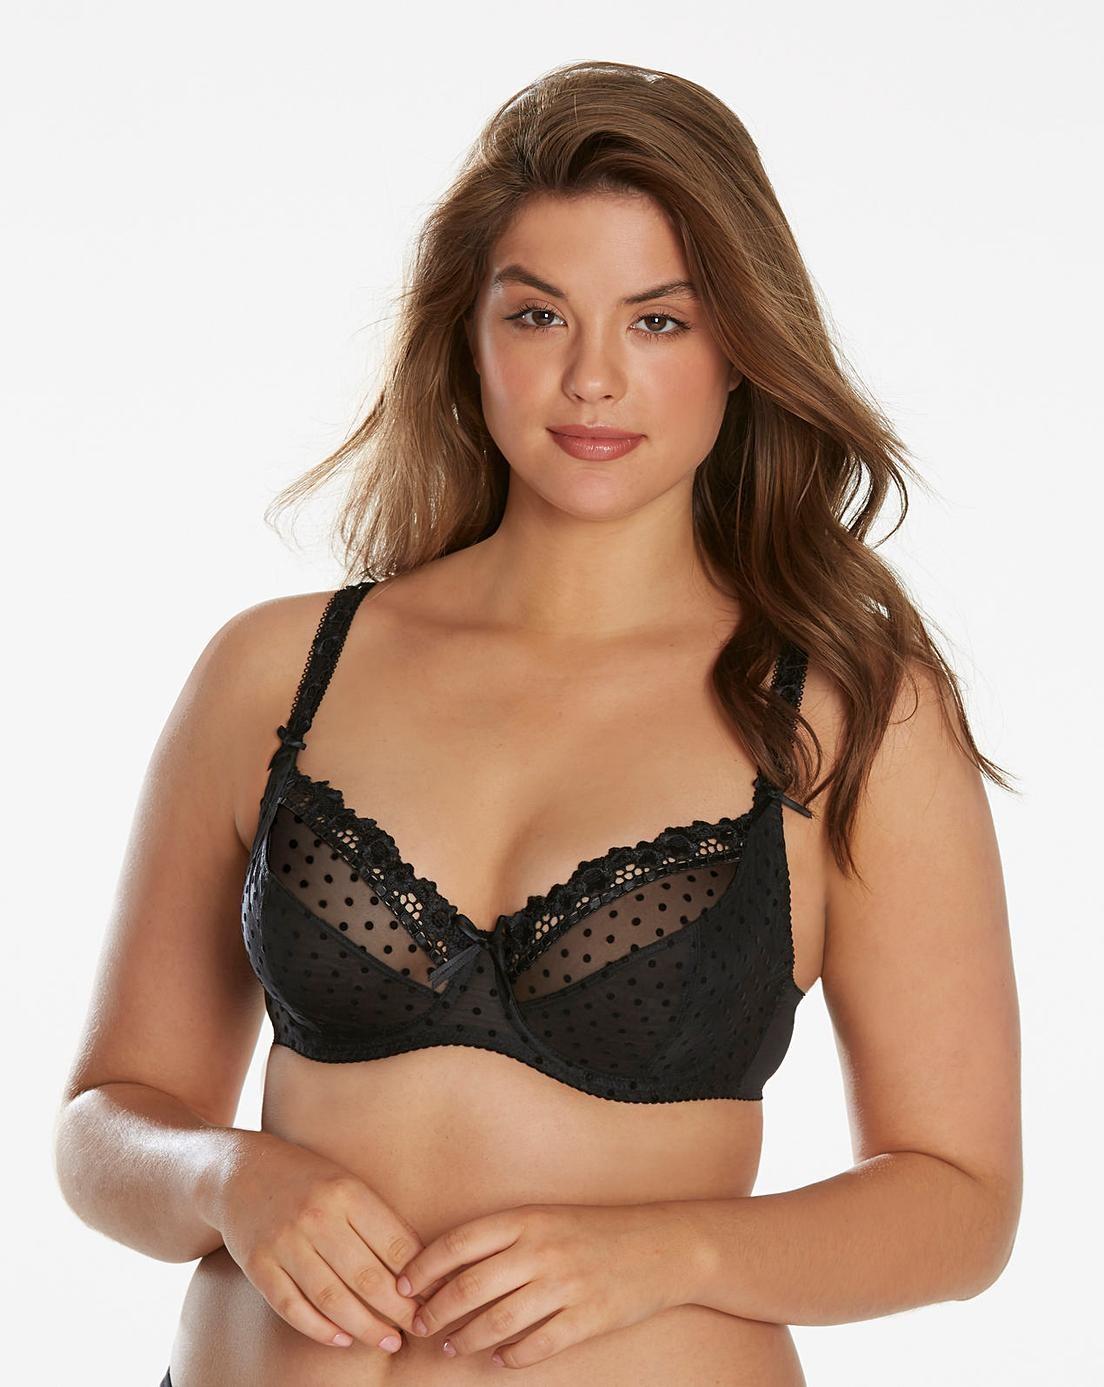 3 Pallets Women's Bras, Swimwear, Undergarments & More, 2,680 Pieces, Ext. Retail £77,594, Shaw, UK